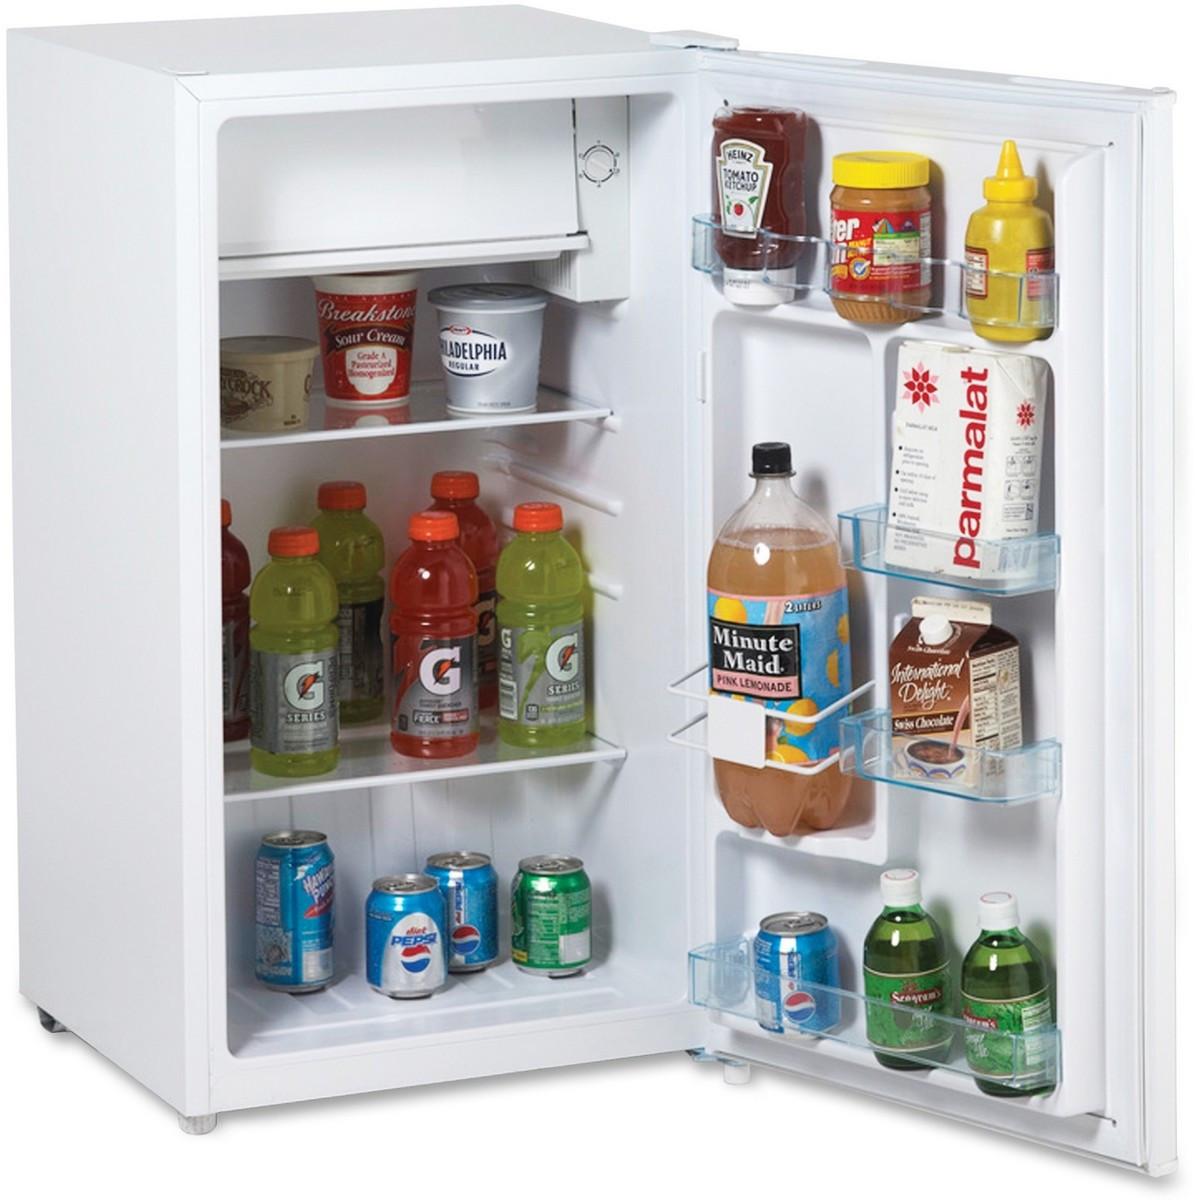 Roper Refrigerator Manual | Avanti Refrigerator | Compact Two Door Refrigerator